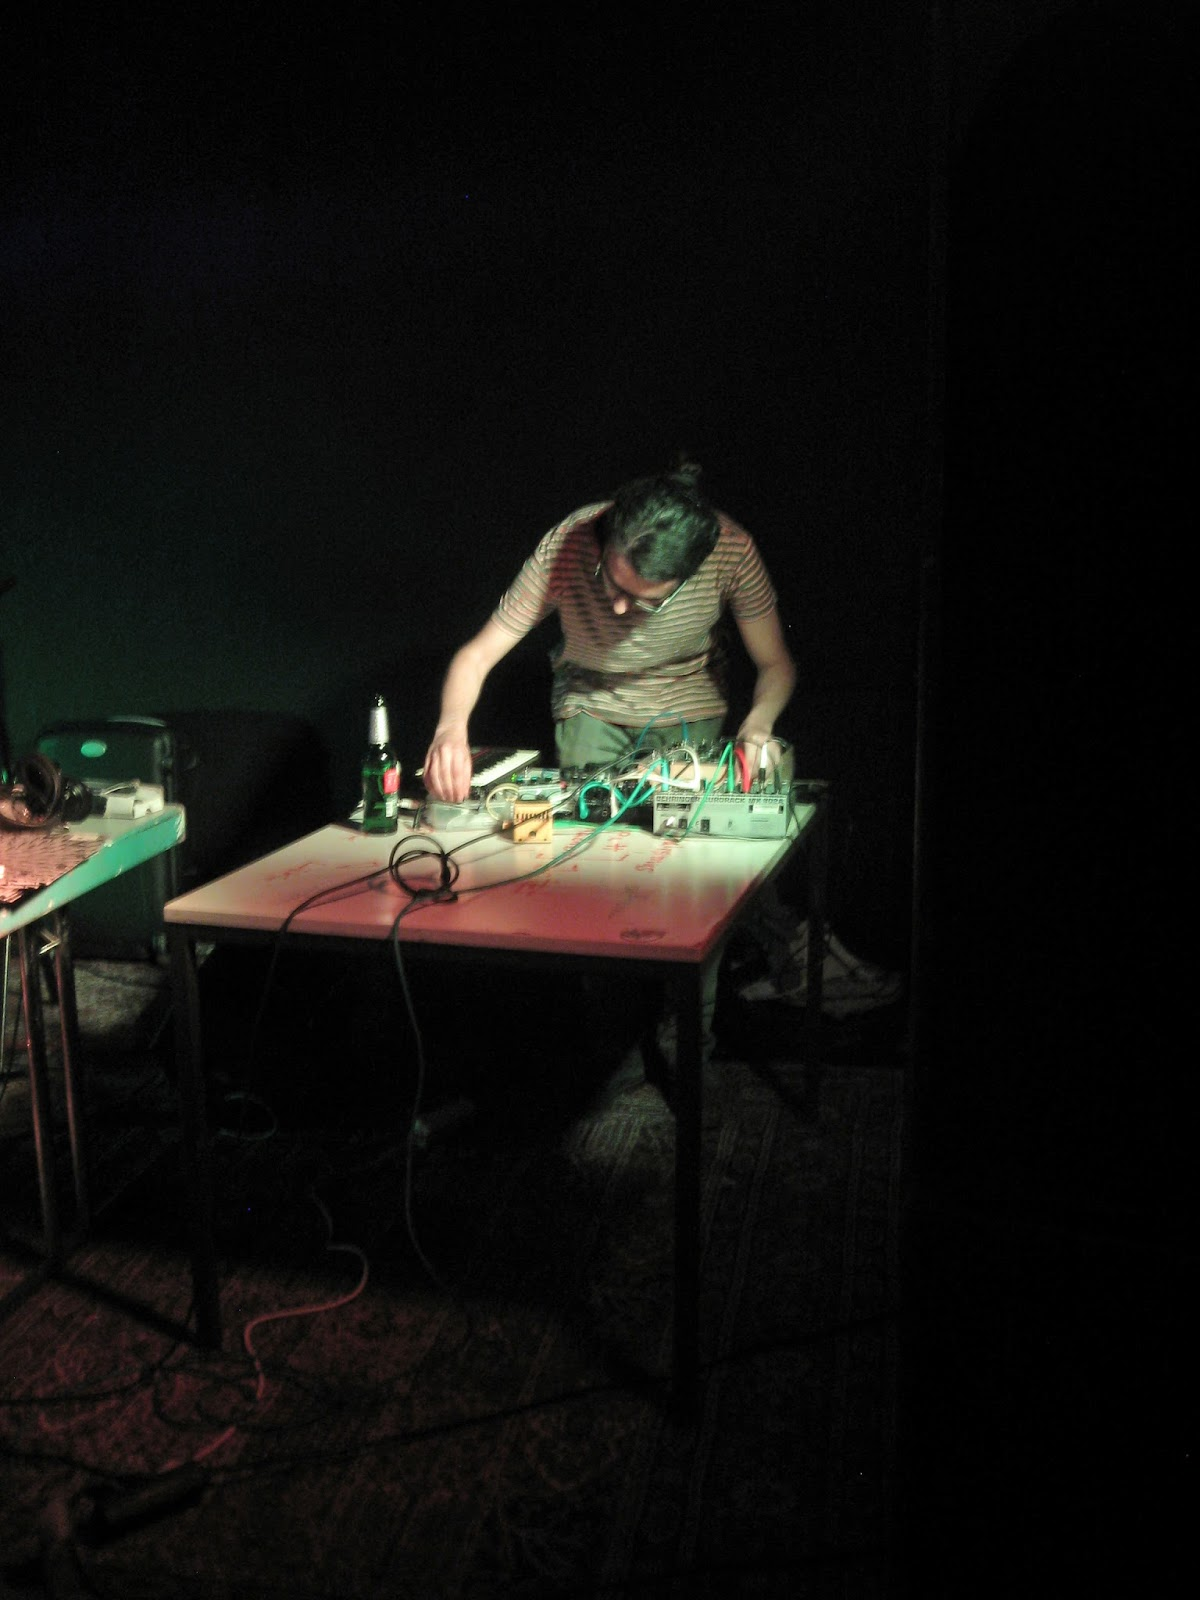 Gael Moissonnier Uncertain Random-Noise Loops Bursting Through Eternity